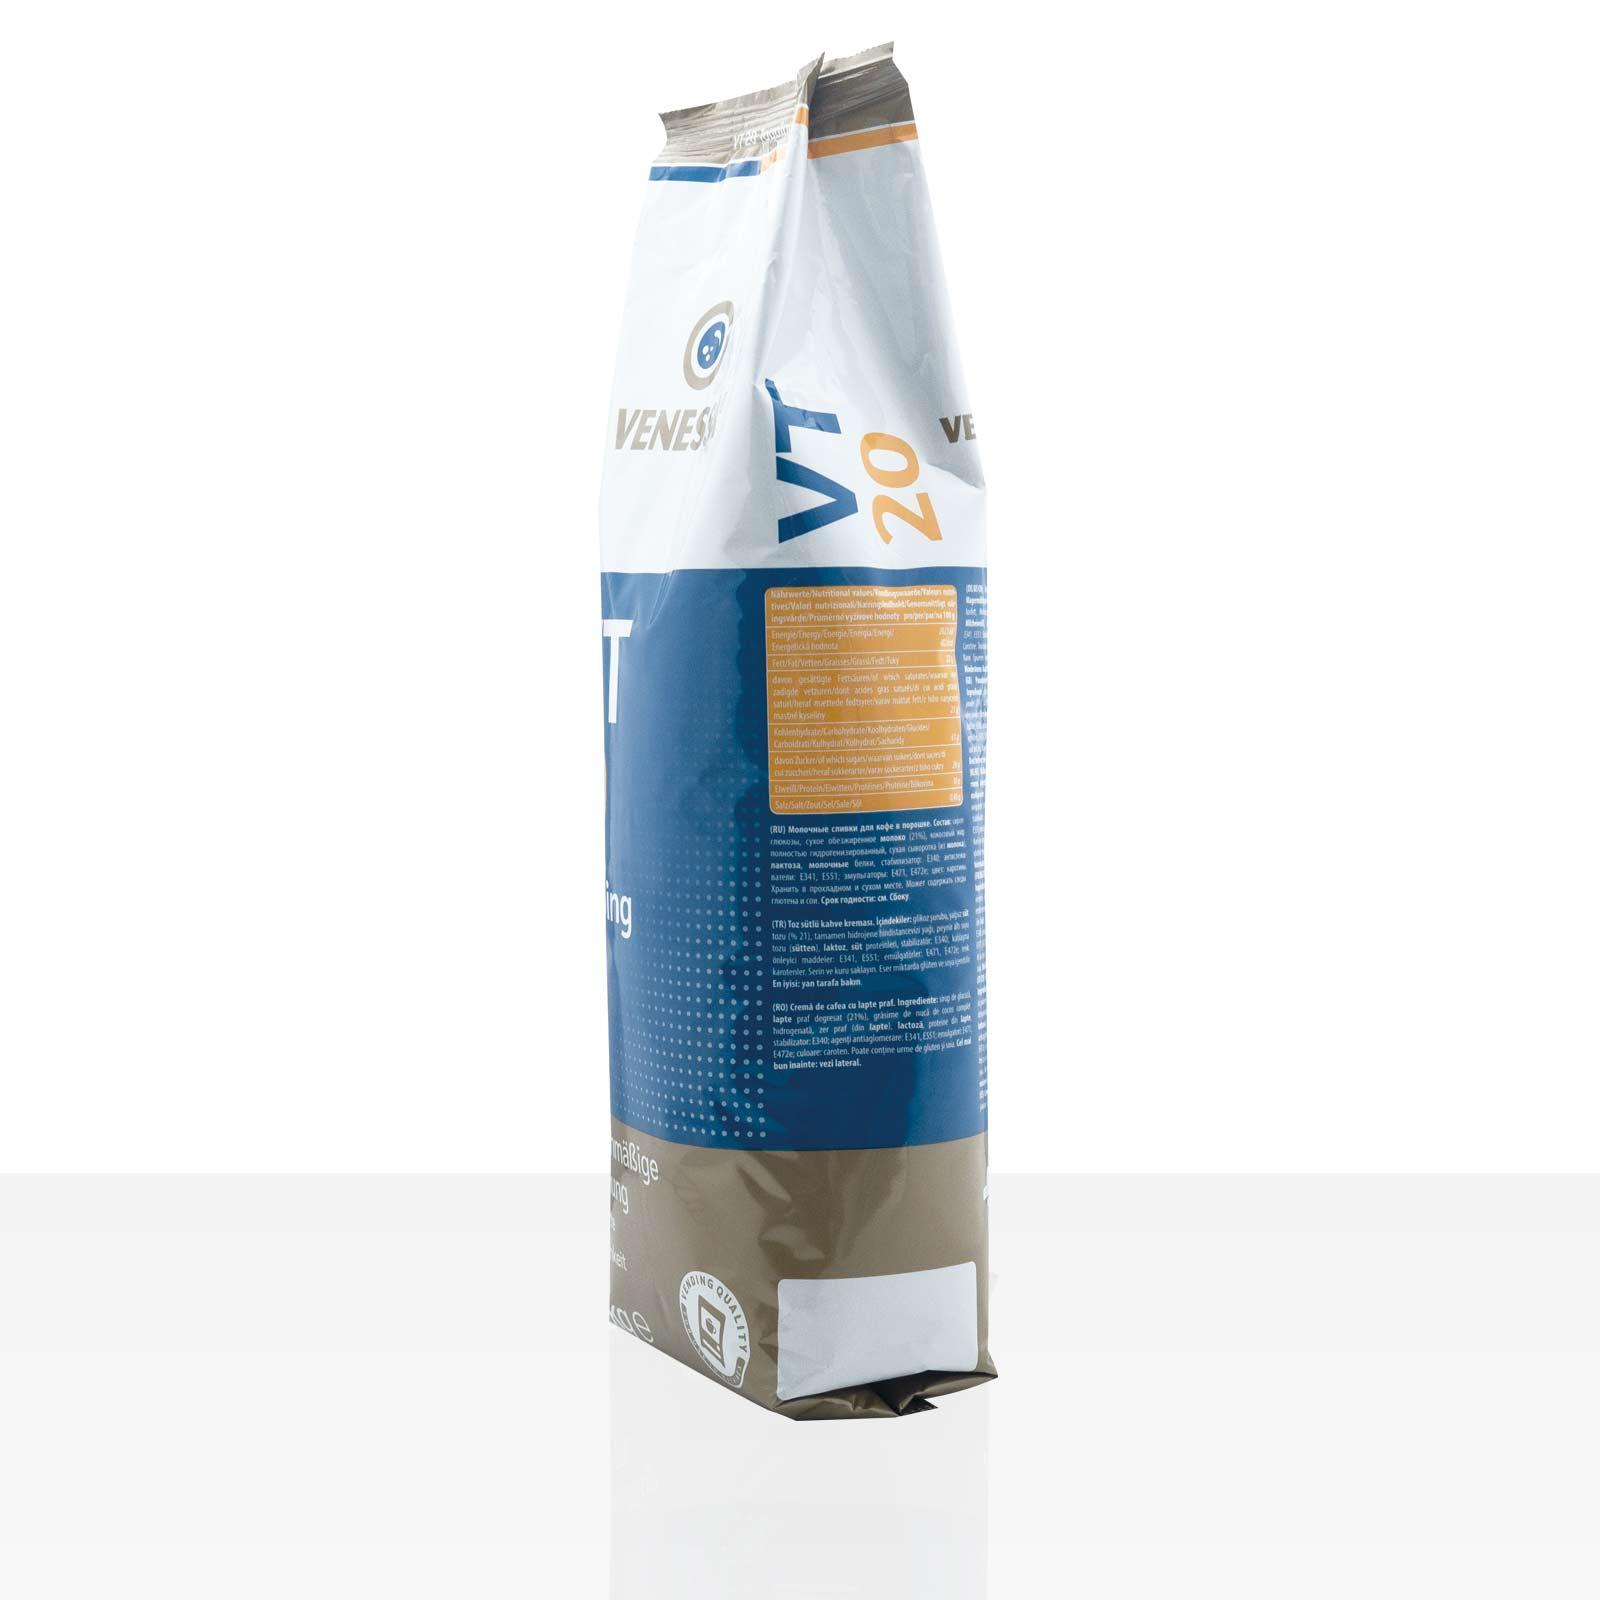 Venessa VT 20 Topping 10 x 1kg Milchpulver